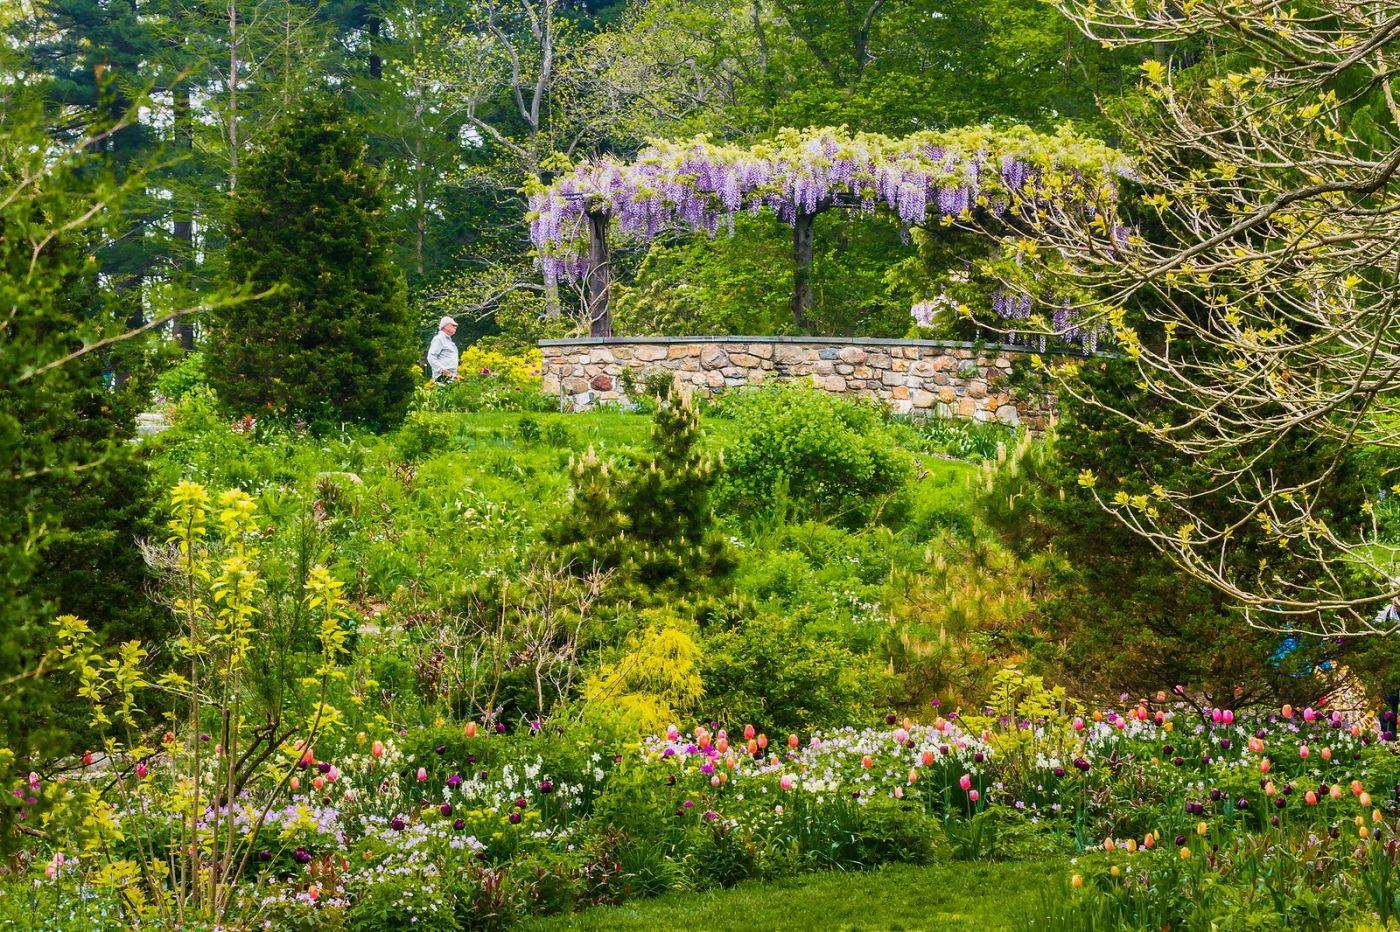 Chanticleer花园,那年盛开的紫藤花_图1-31